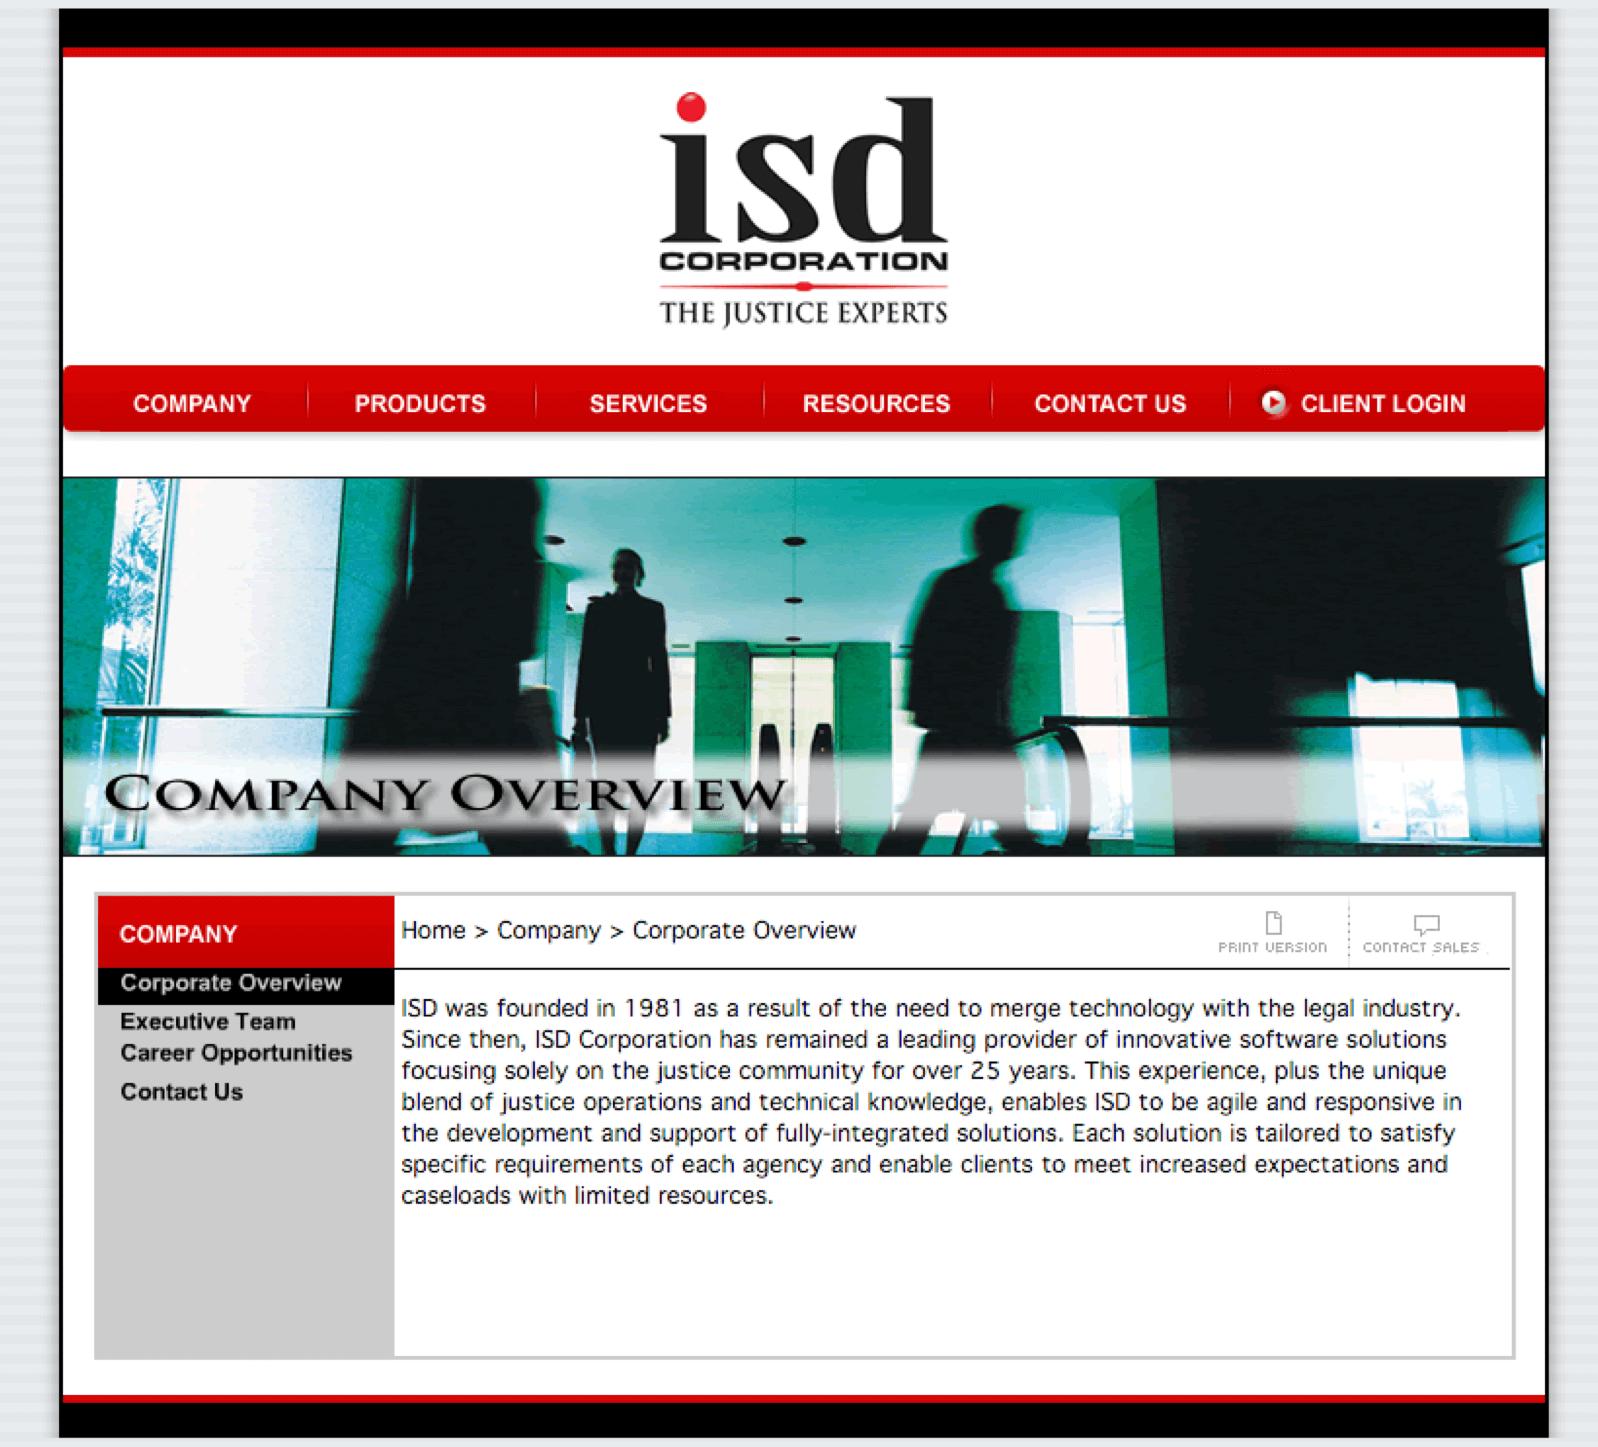 ISD-Corporation-Judicial-Software-Website-Design-Home-Page -Company